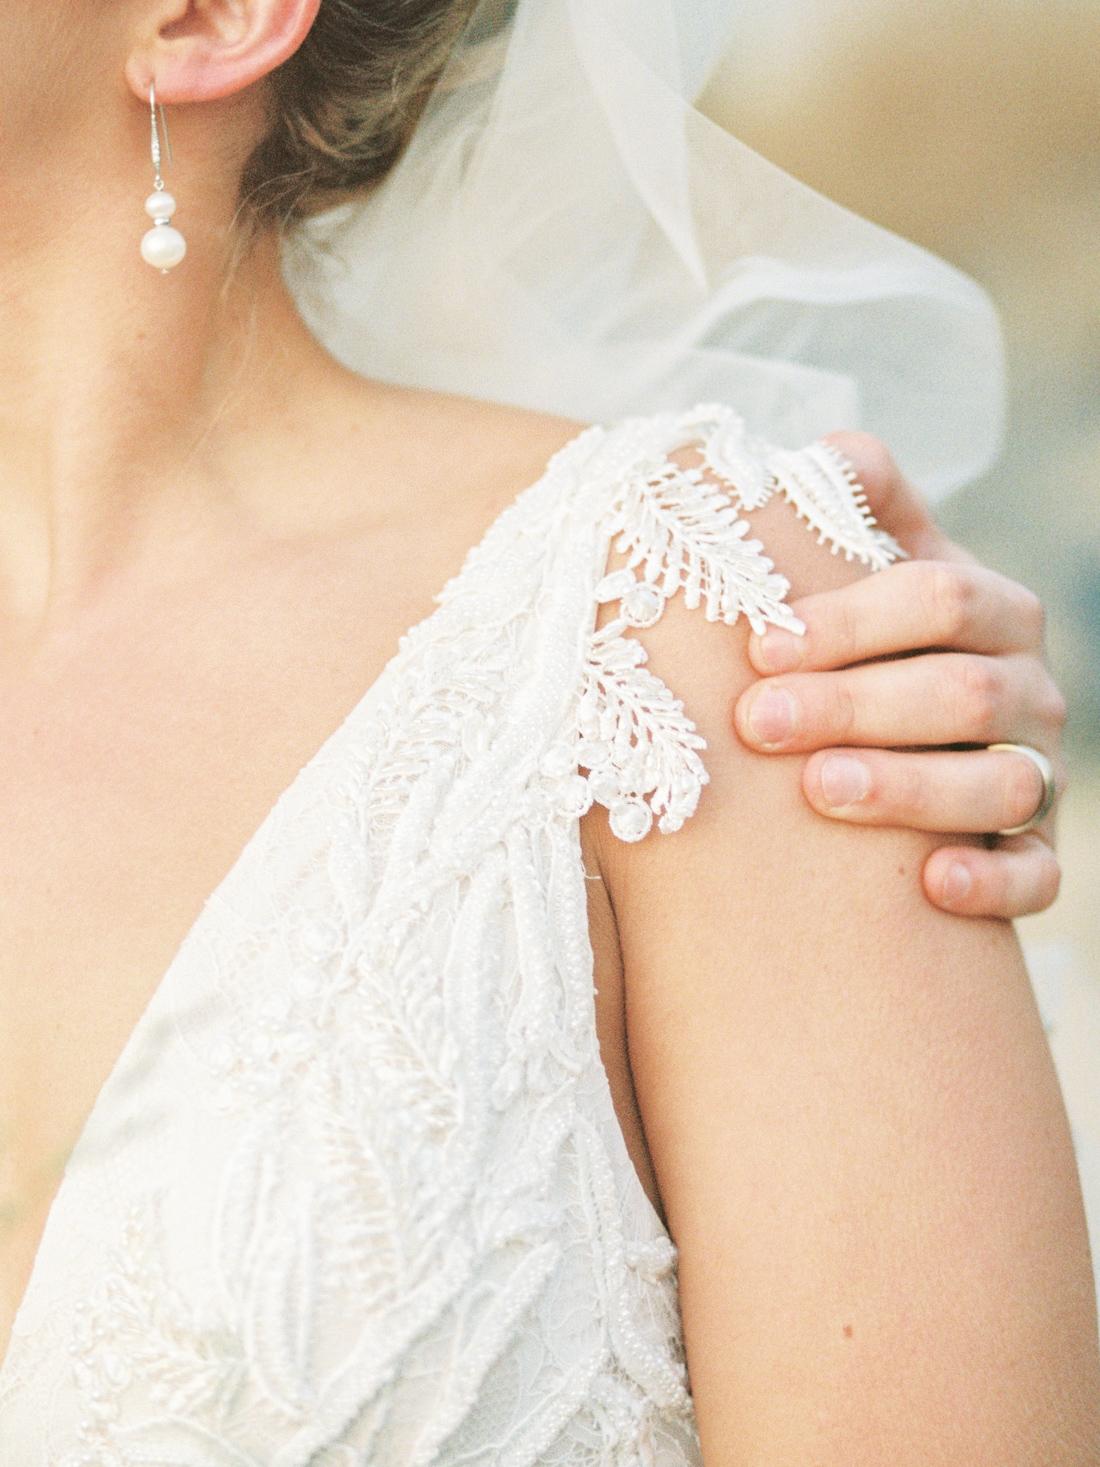 Justin-alexander-old-hollywood-wedding-dress